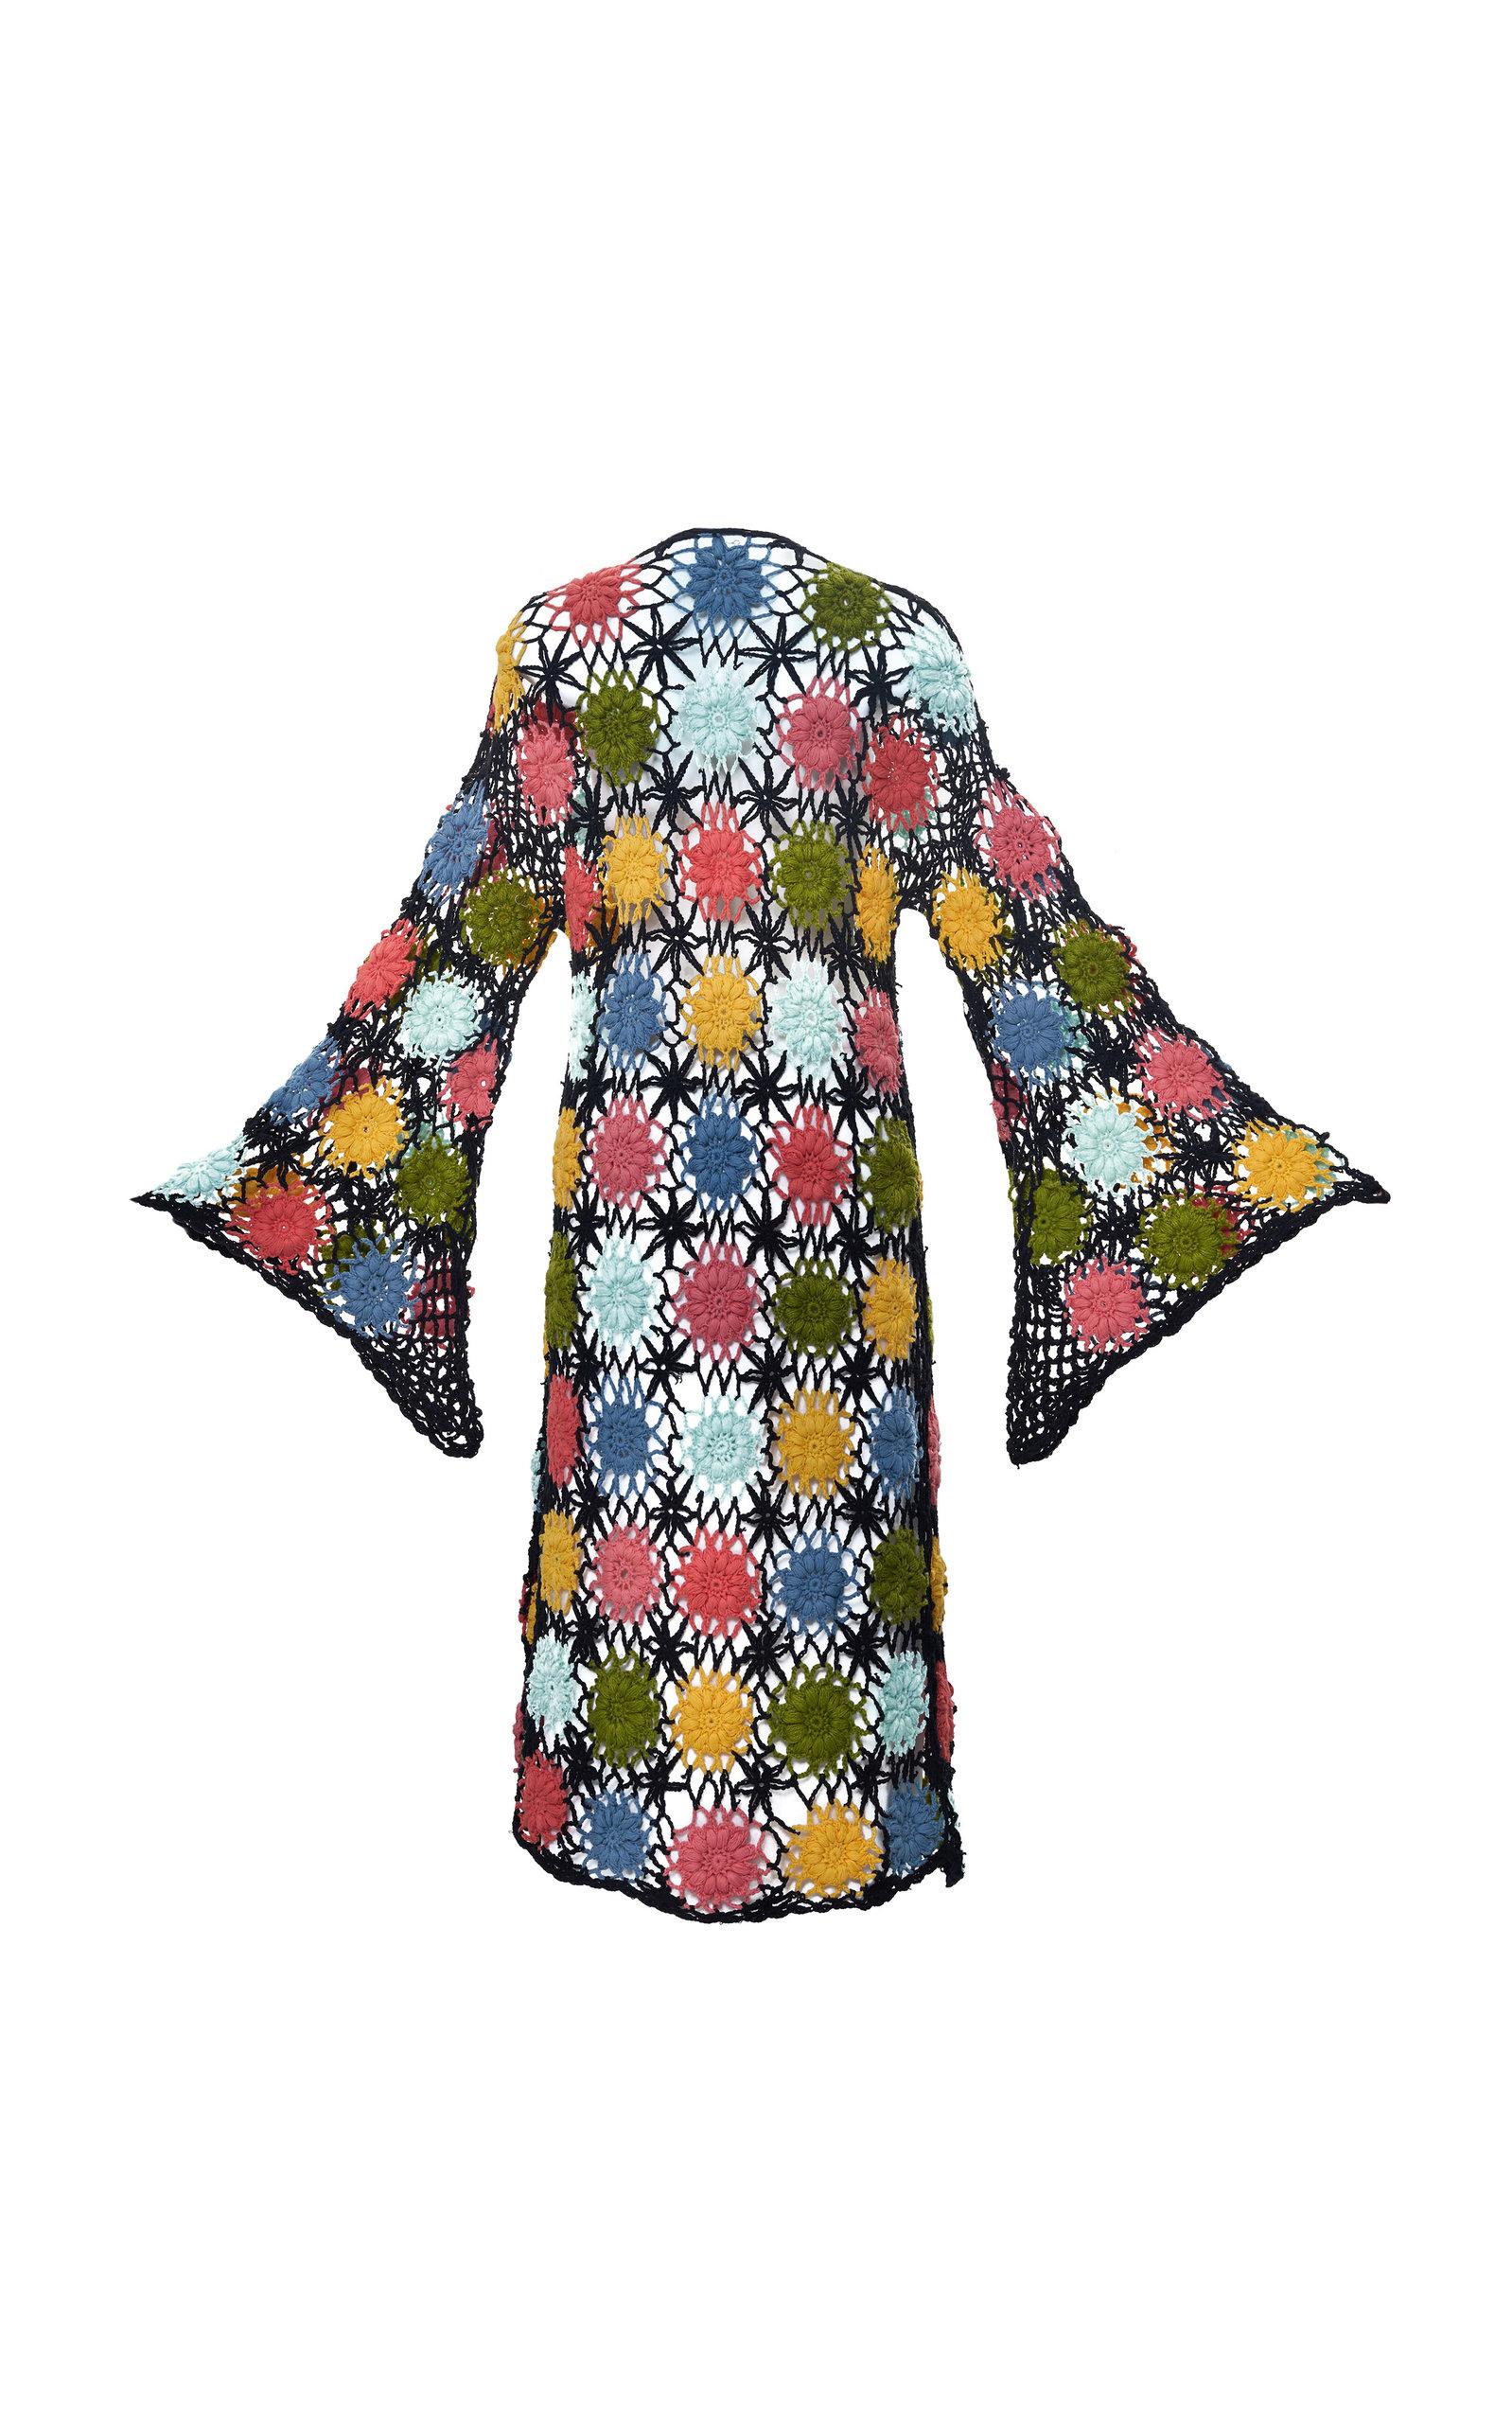 abf89a9d73a6 Gypsy Coat by Celia B | Moda Operandi